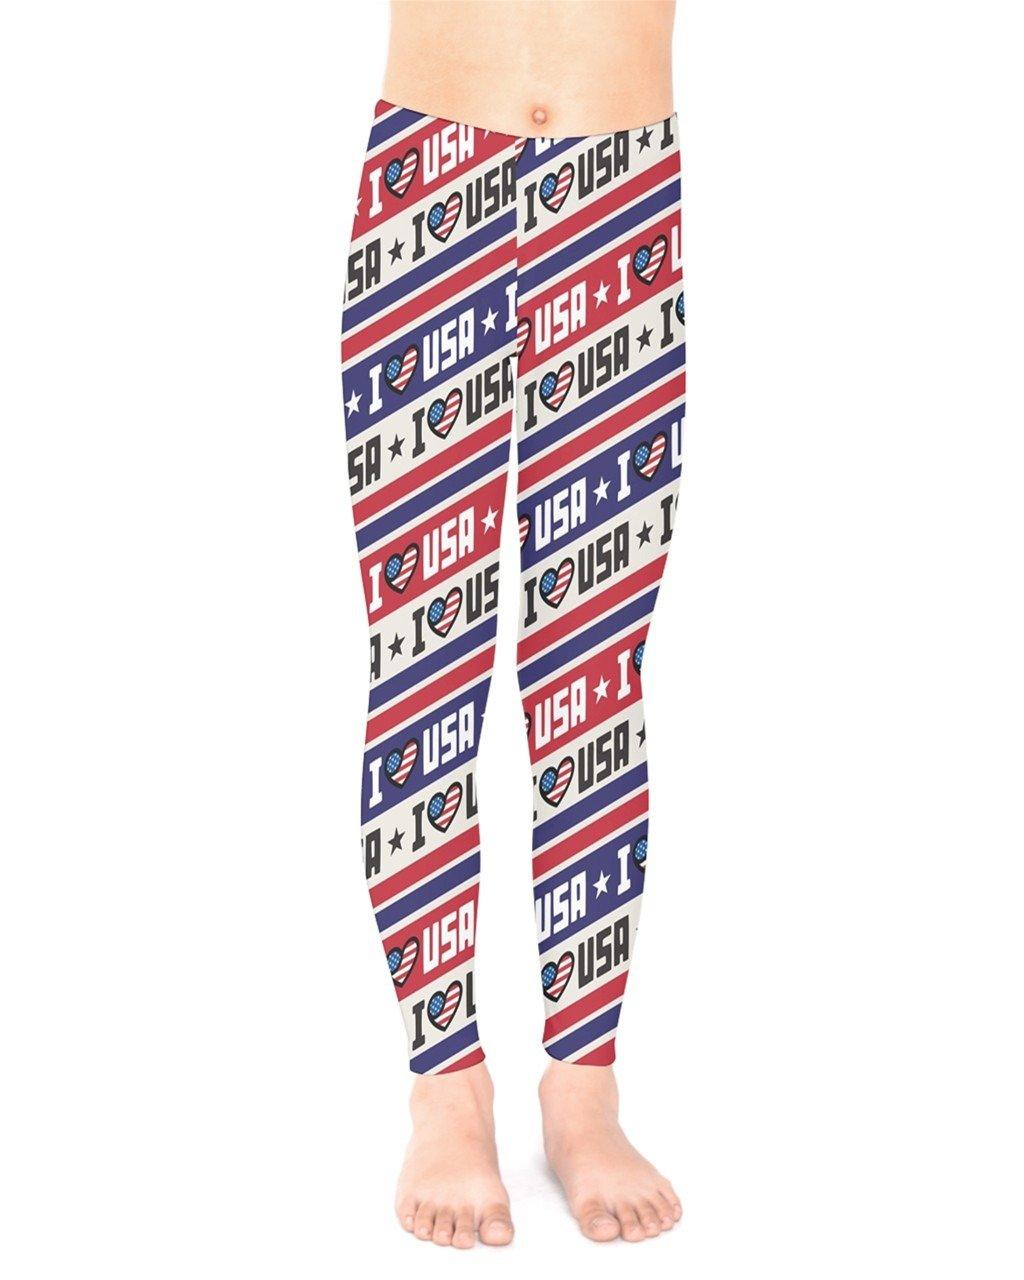 PattyCandy Toddler Unisex Tights I Love USA Patriotic Kids Leggings - 6